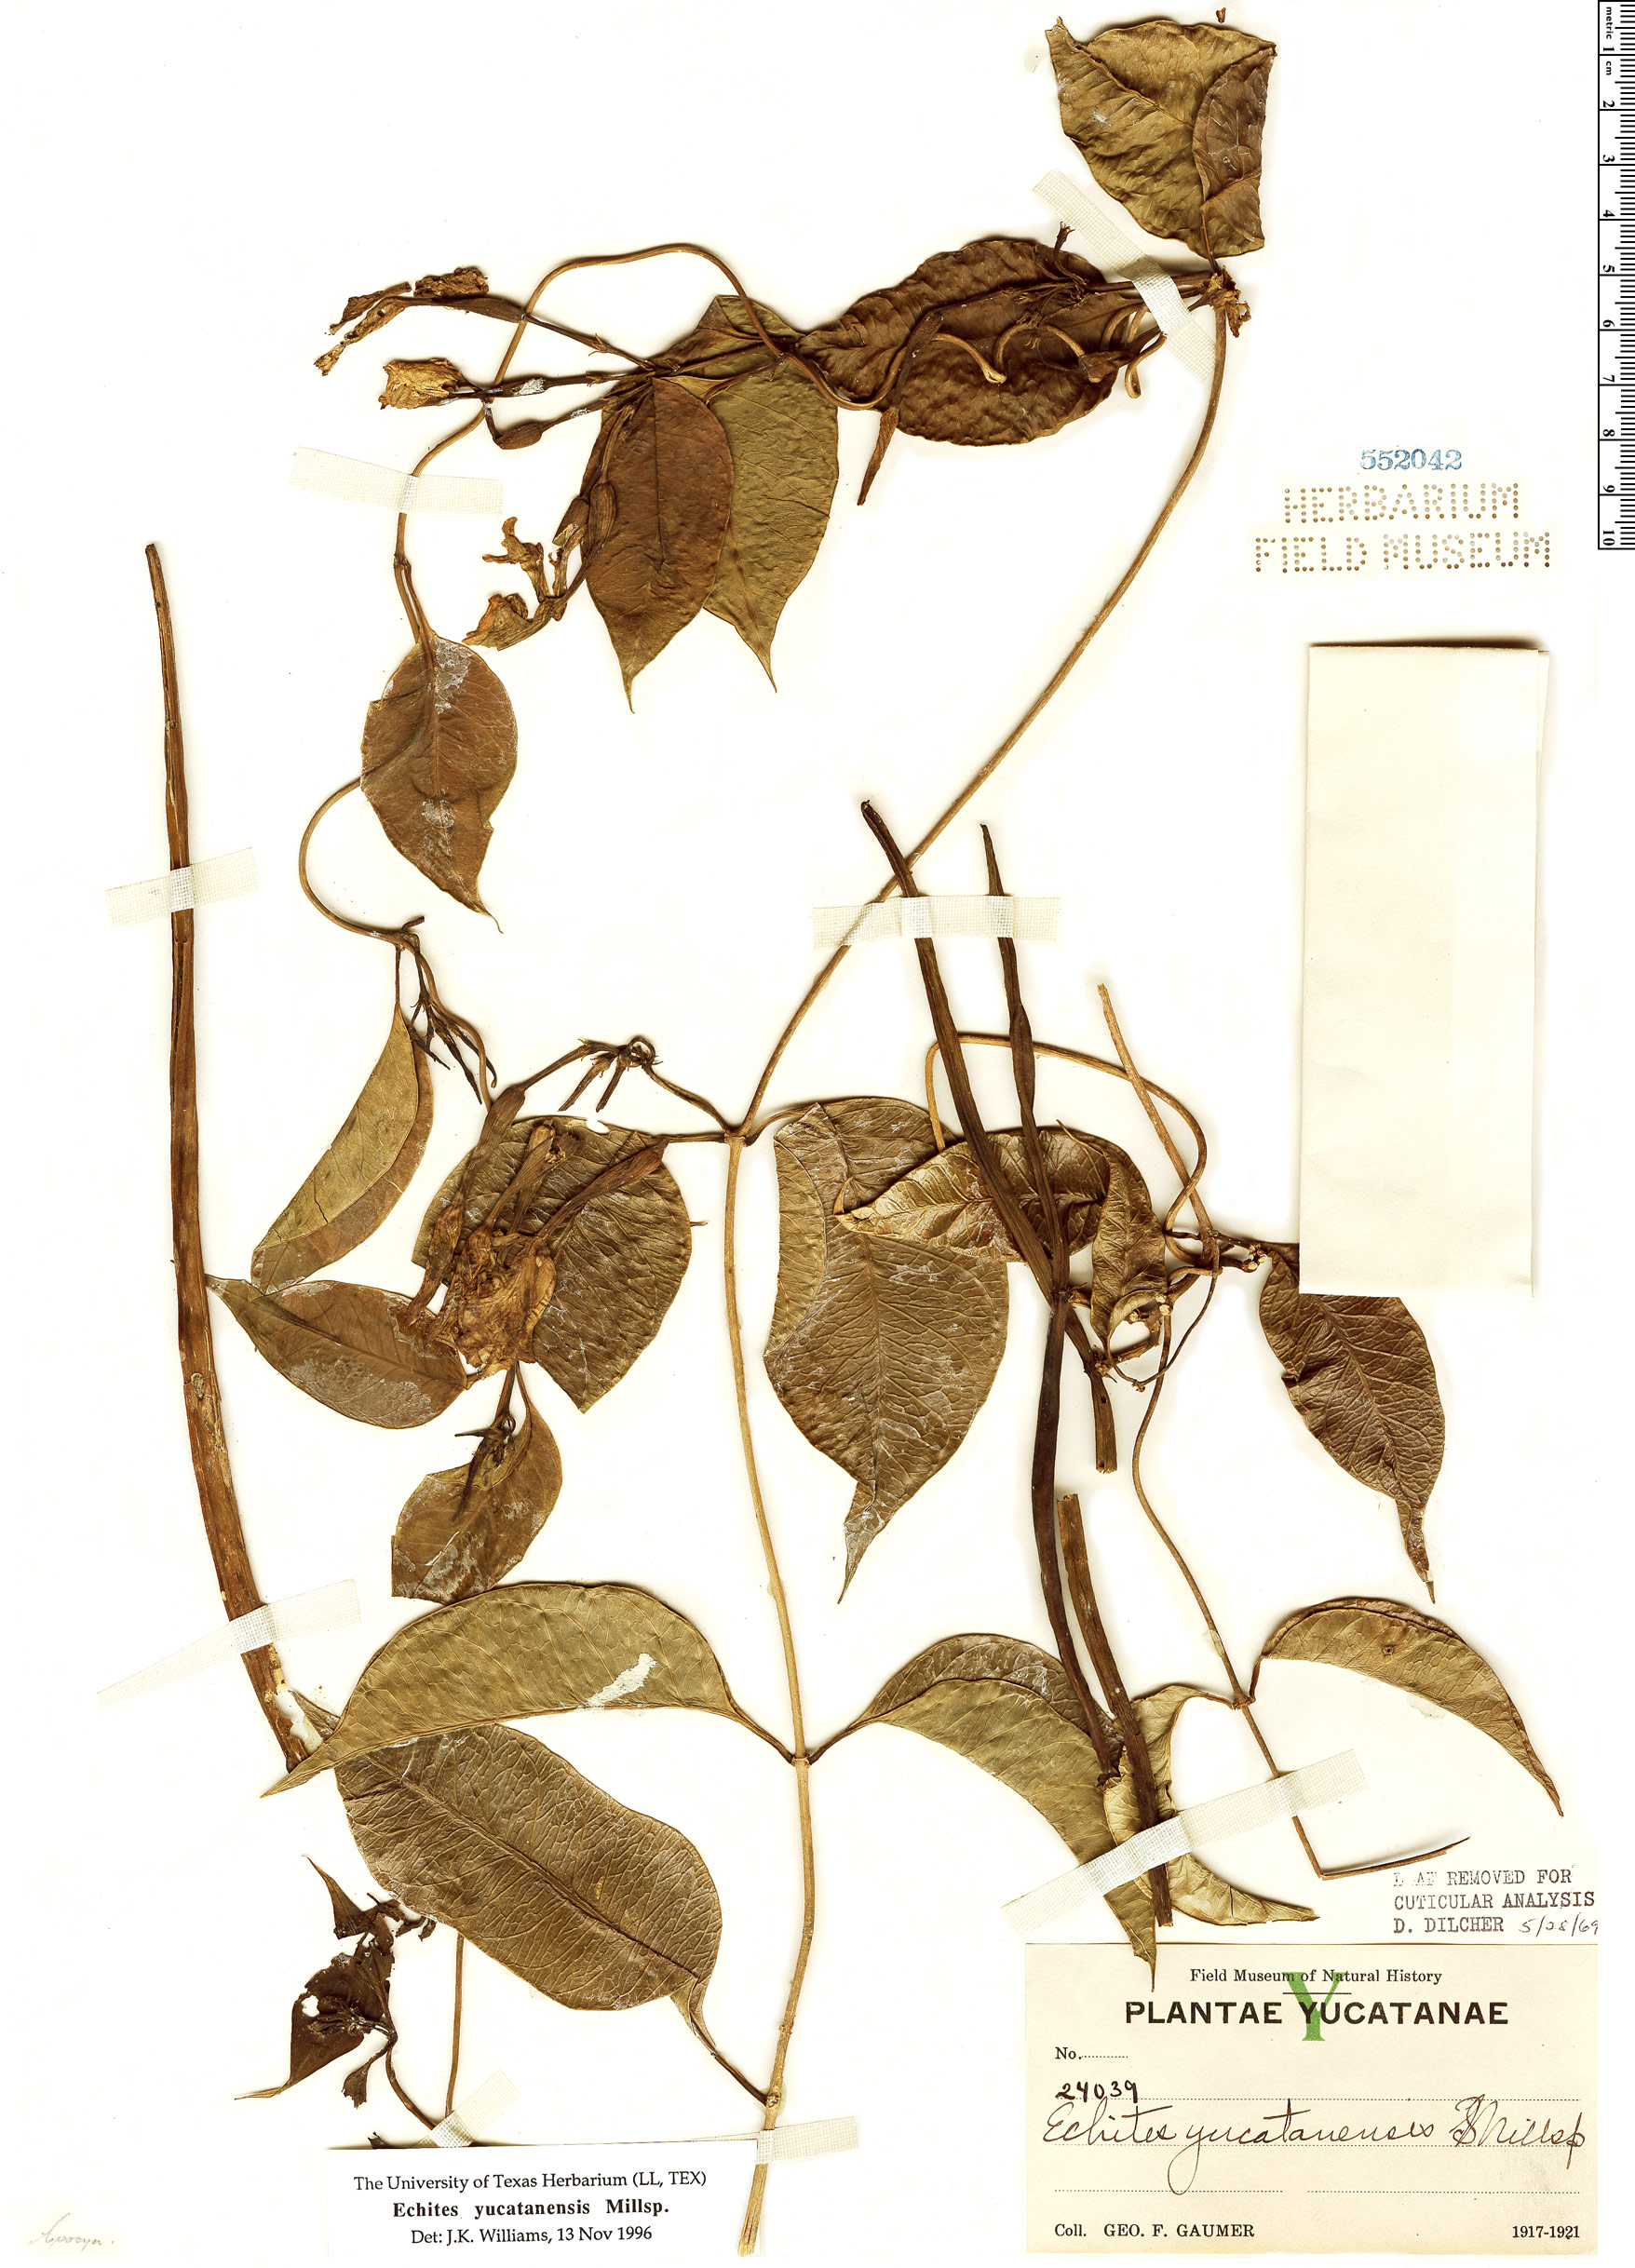 Specimen: Echites yucatanensis